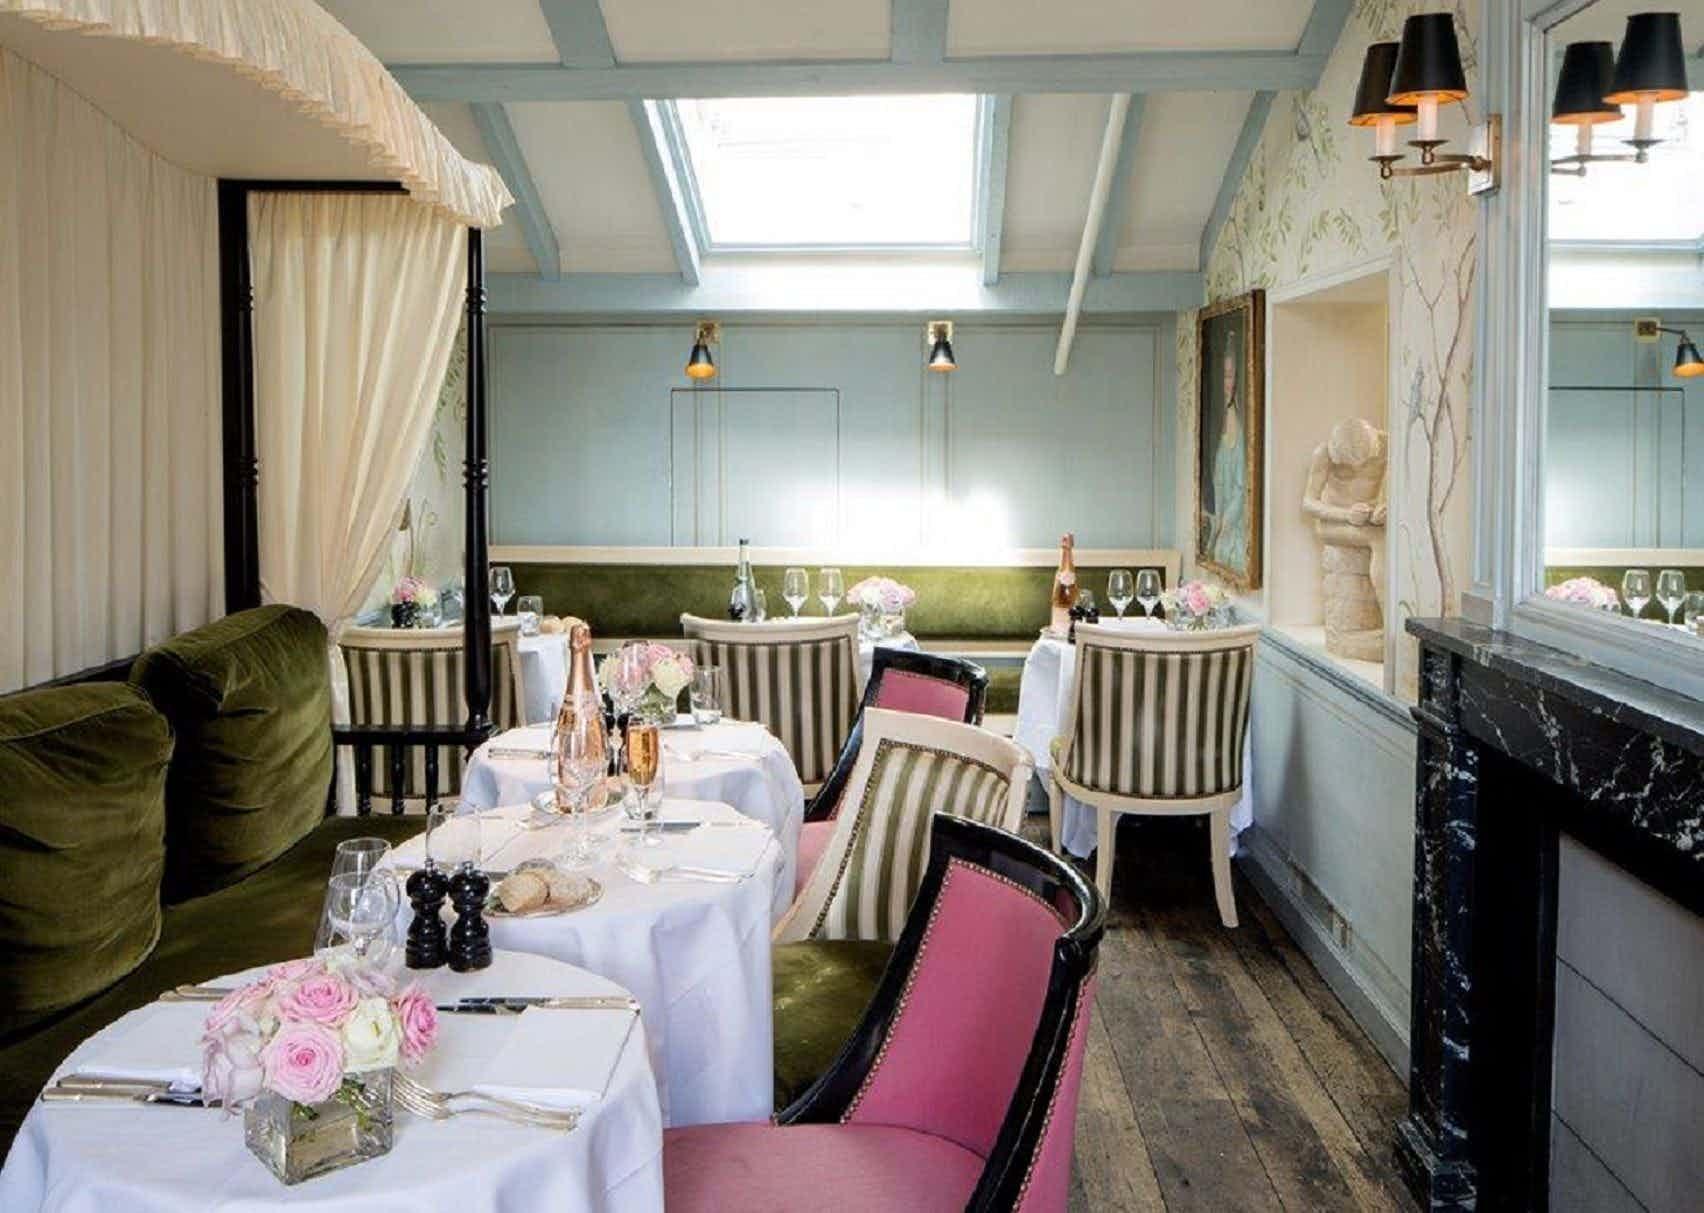 The Traveller's Tea Room, Ladurée at Covent Garden